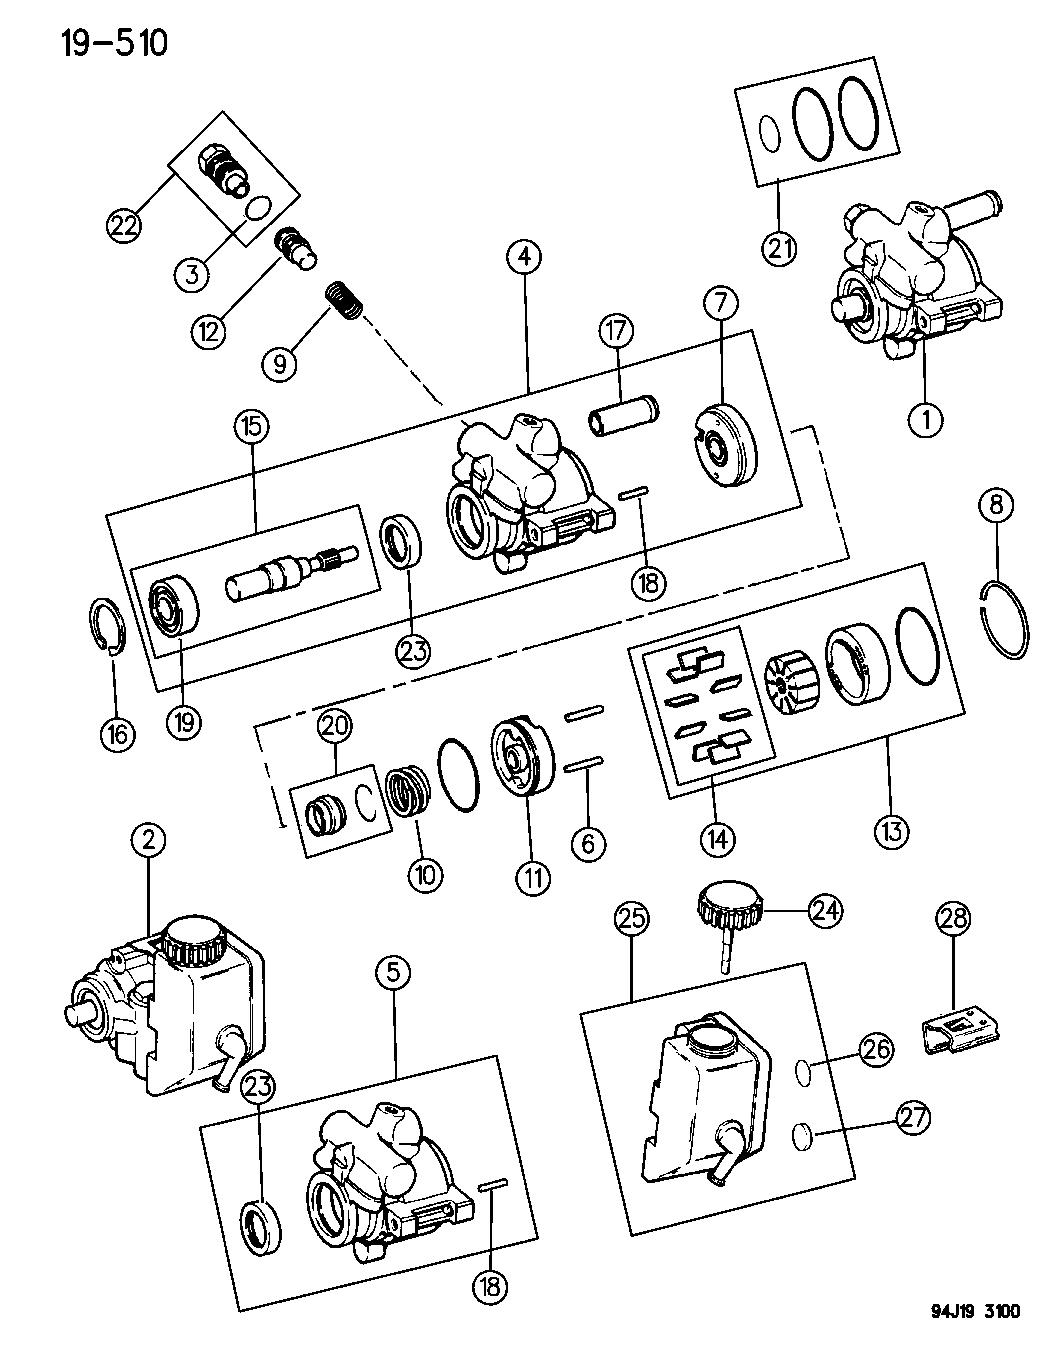 resource?t=d&s=l&r=AB690C35588EE91C96F2A940FCFFADF30F3421C57EE6C91FBC6F8BE41A2DDA7D 1994 jeep wrangler power steering pump mopar parts giant